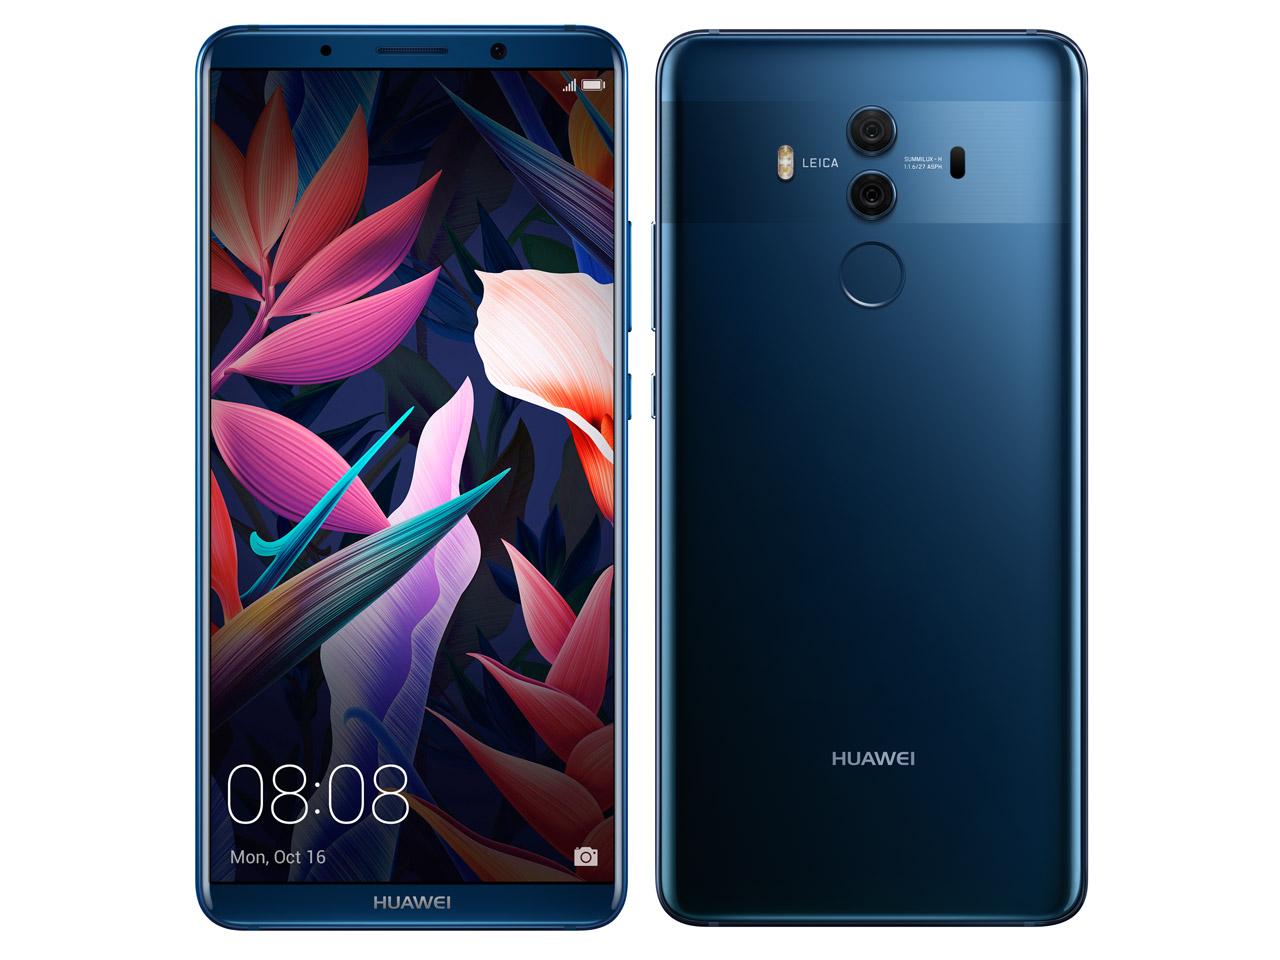 DMM mobileが「HUAWEI Mate 10 Pro」を1万円値下げ。ただしイートレンドが最安値。